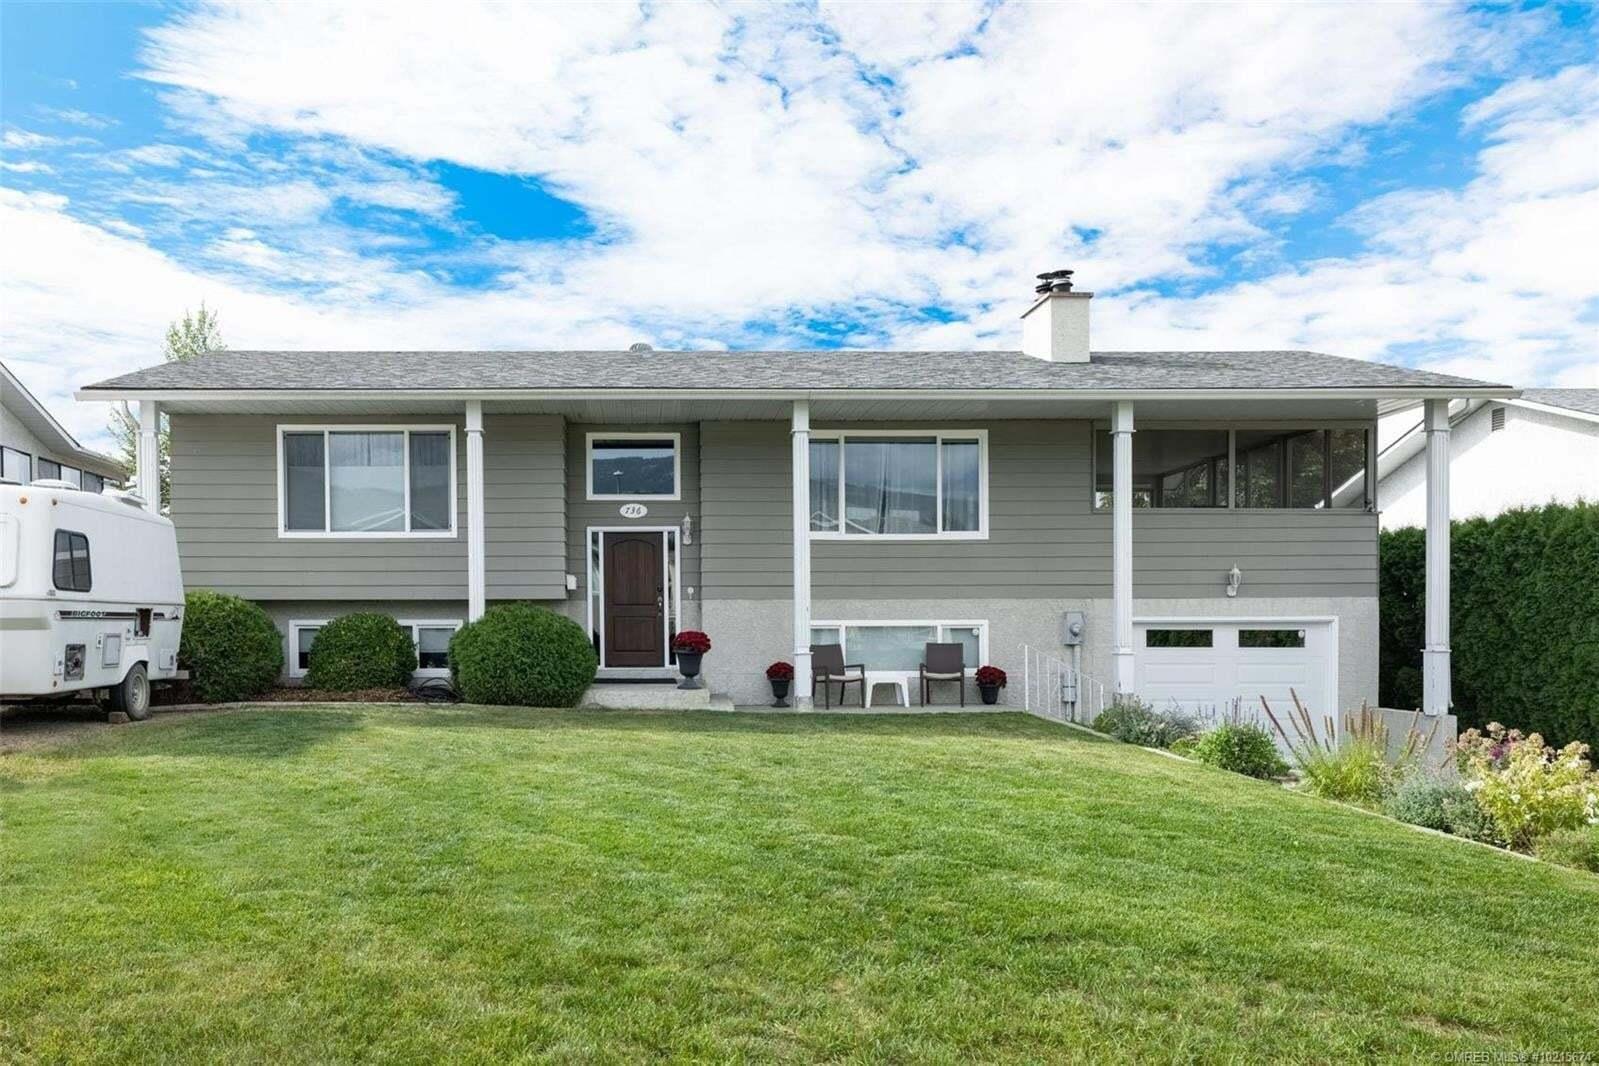 House for sale at 736 Renshaw Rd Kelowna British Columbia - MLS: 10215674